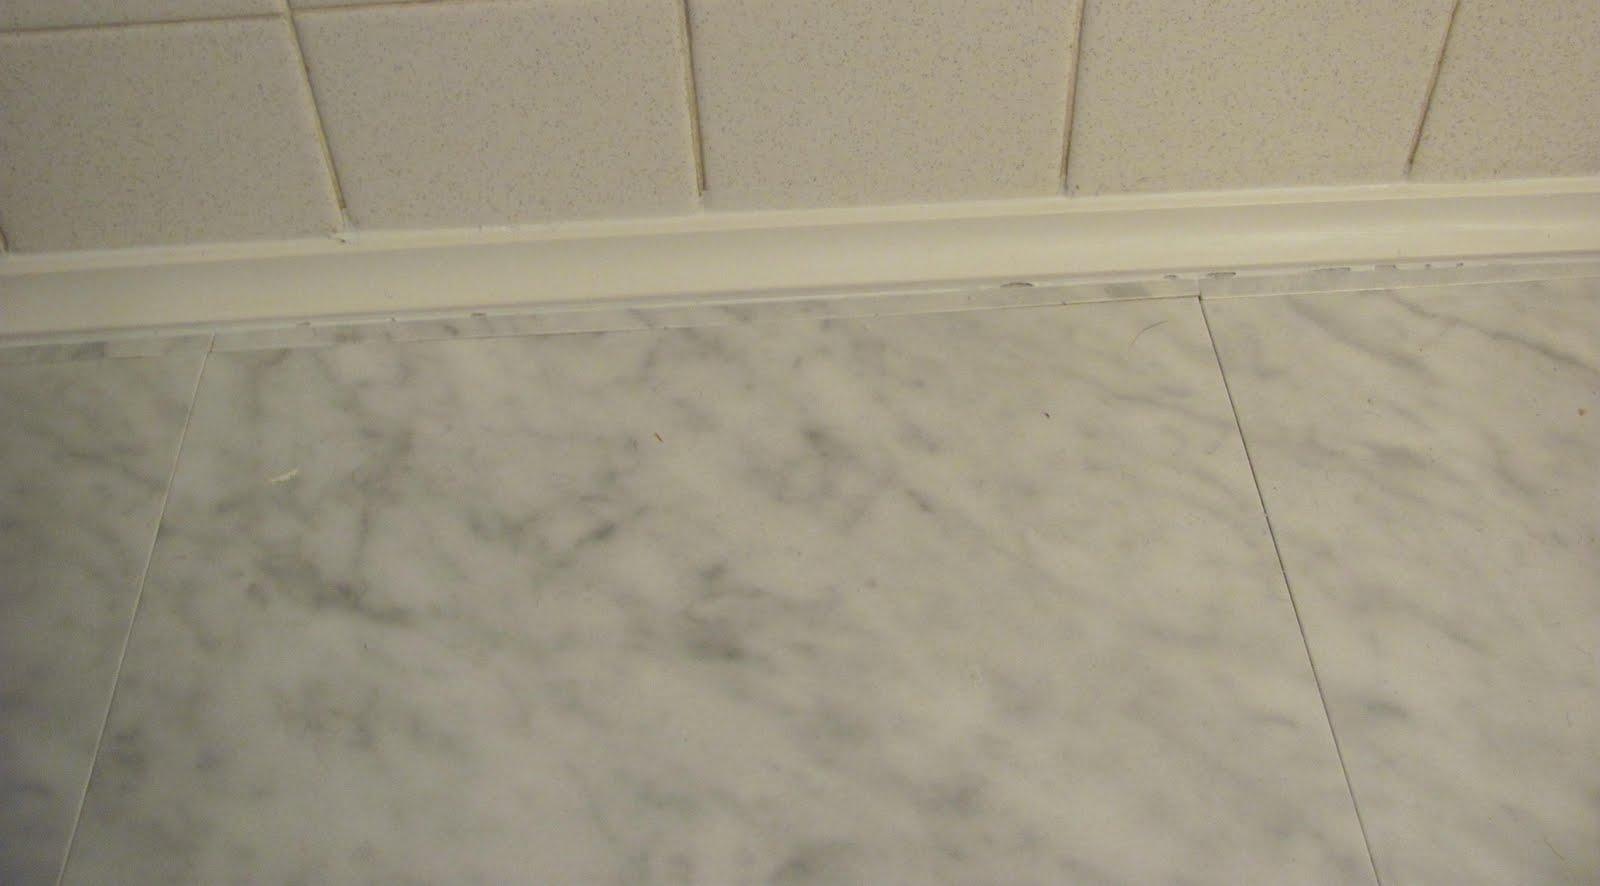 Bathroom Tile Floor Molding : Bathroom floor trim wood floors